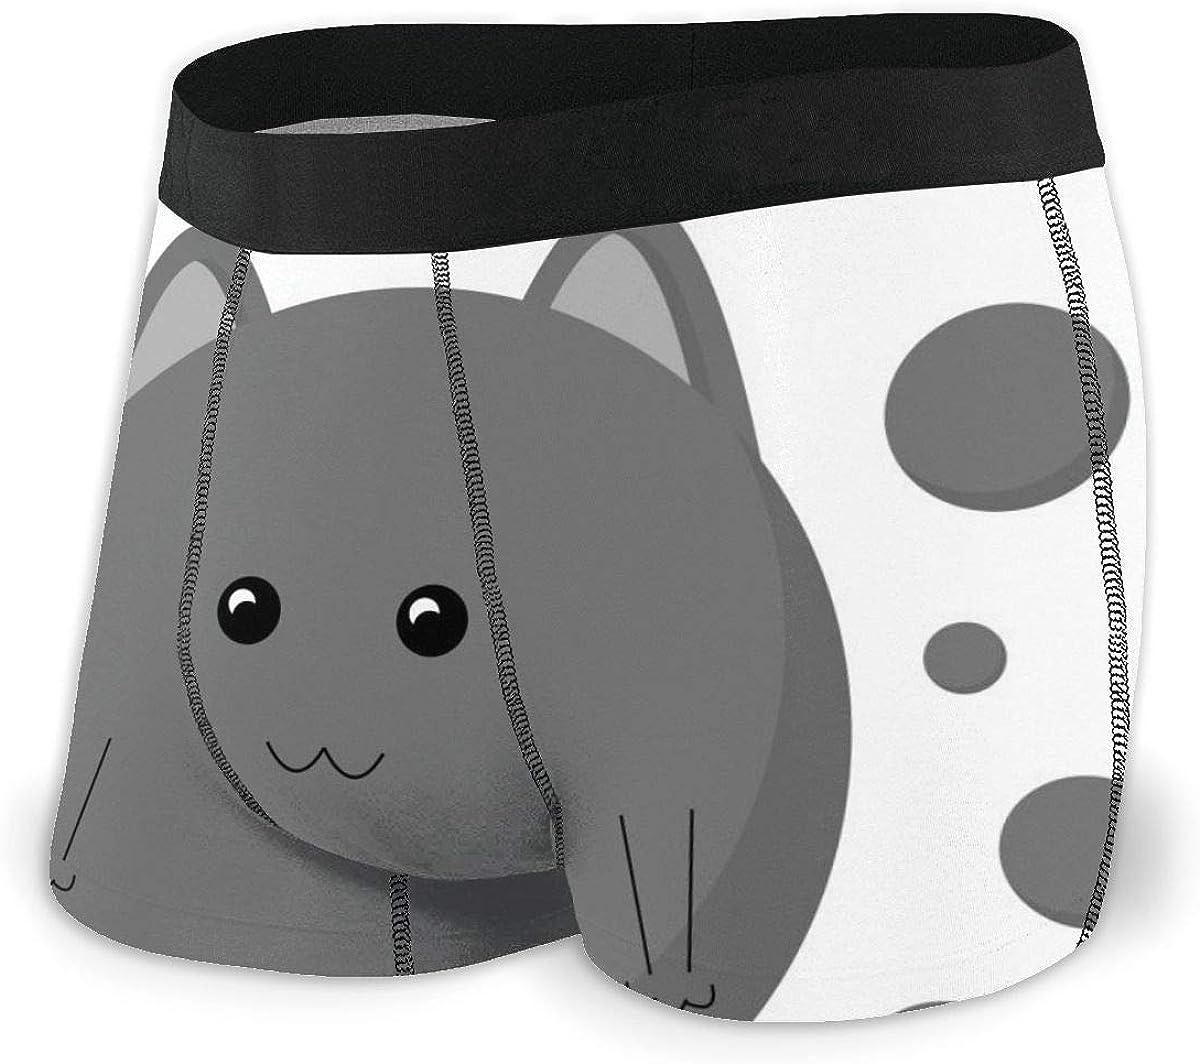 Mens Underwear Funny Gray Ball Cute Cat Kitten Boys Boxer Briefs Trunks Low Rise Underpants Man